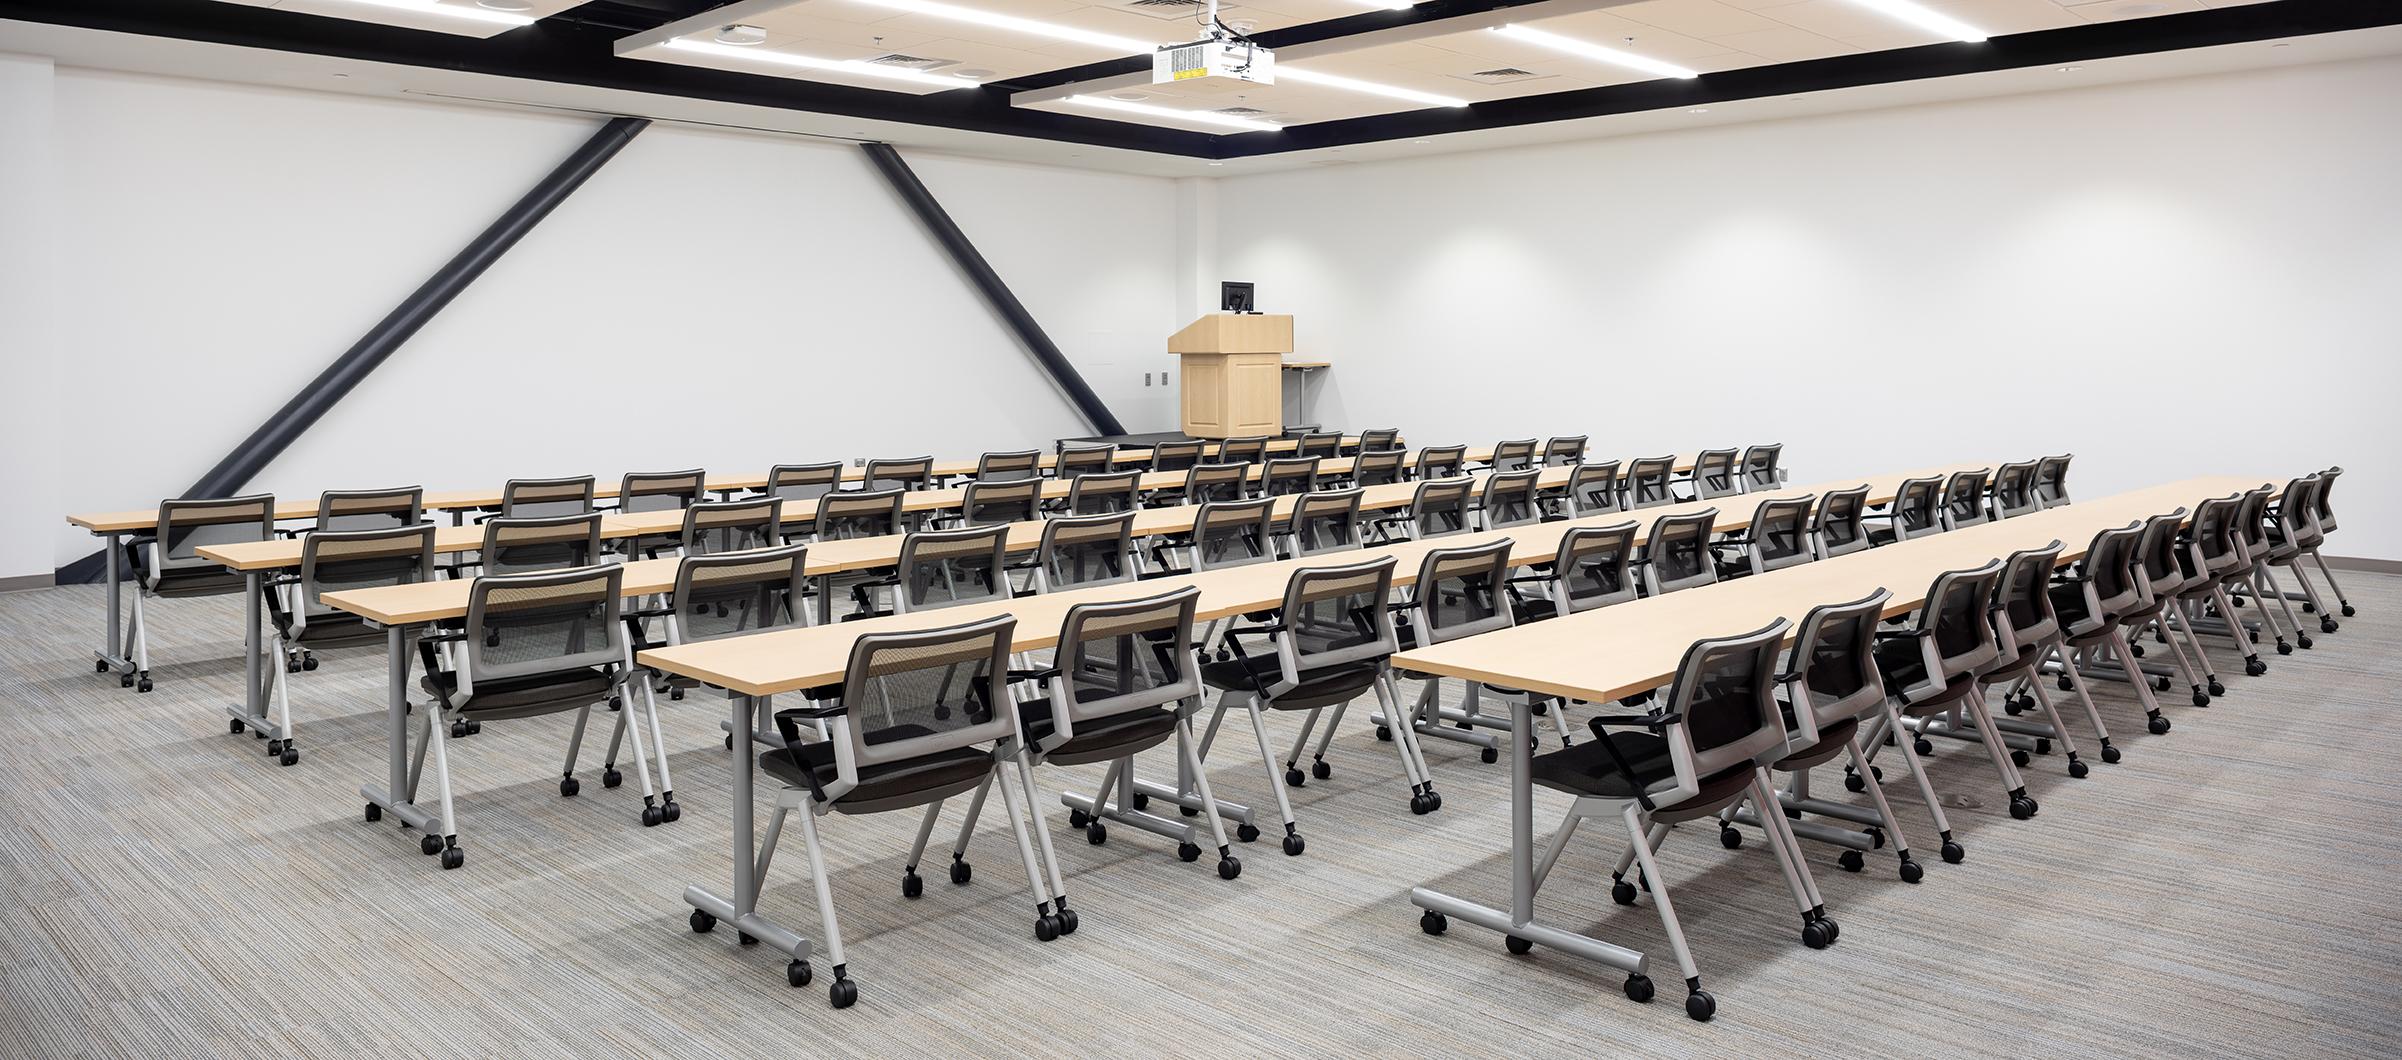 ADW-Public-Safety-MEDIC-Headquarters-Charlotte-NC-Classroom.jpg